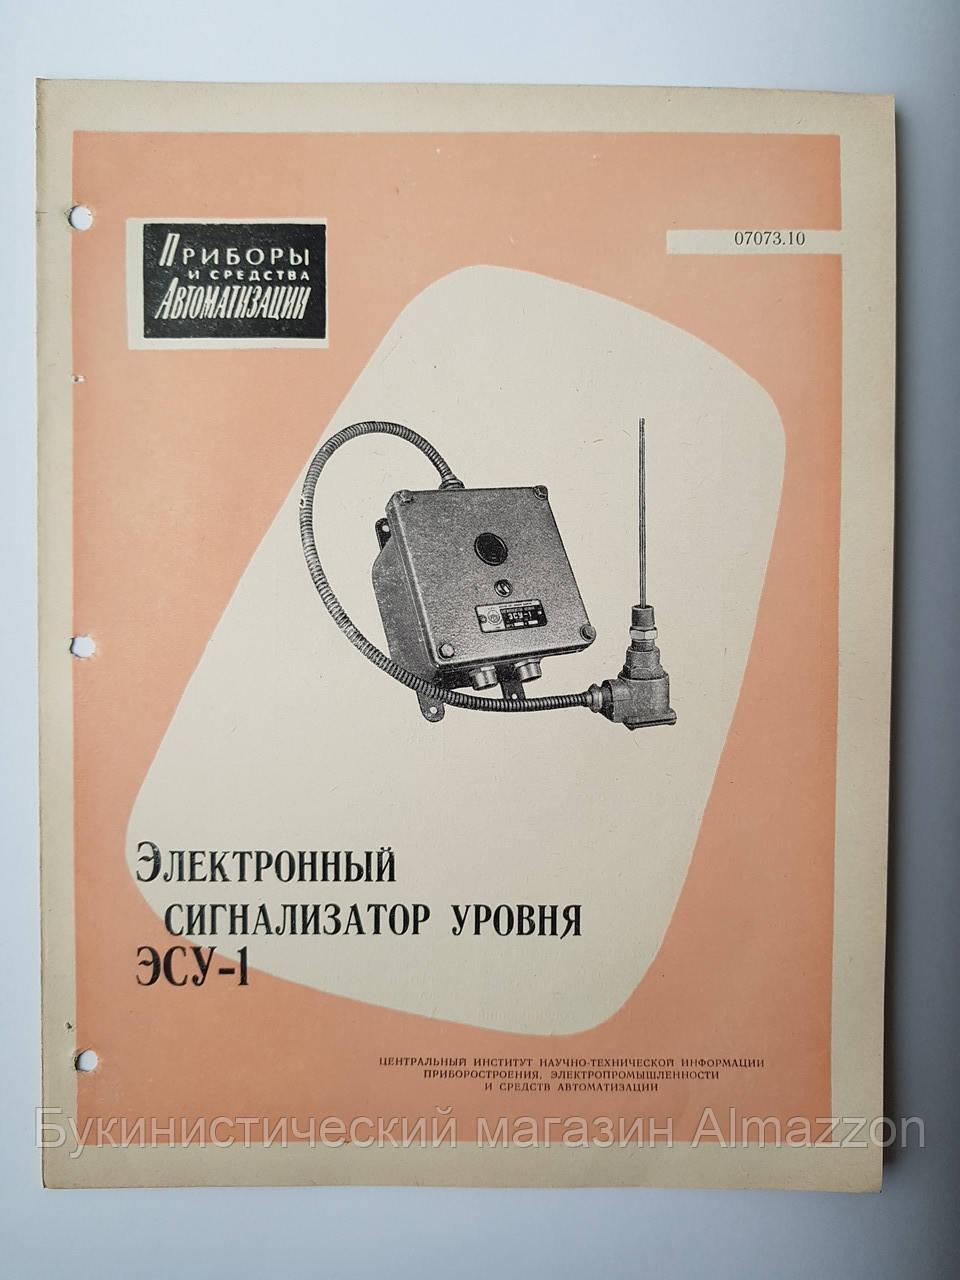 "Журнал (Бюллетень) ""Электронный сигнализатор уровня ЭСУ-1  07073.10"" 1963 г., фото 1"